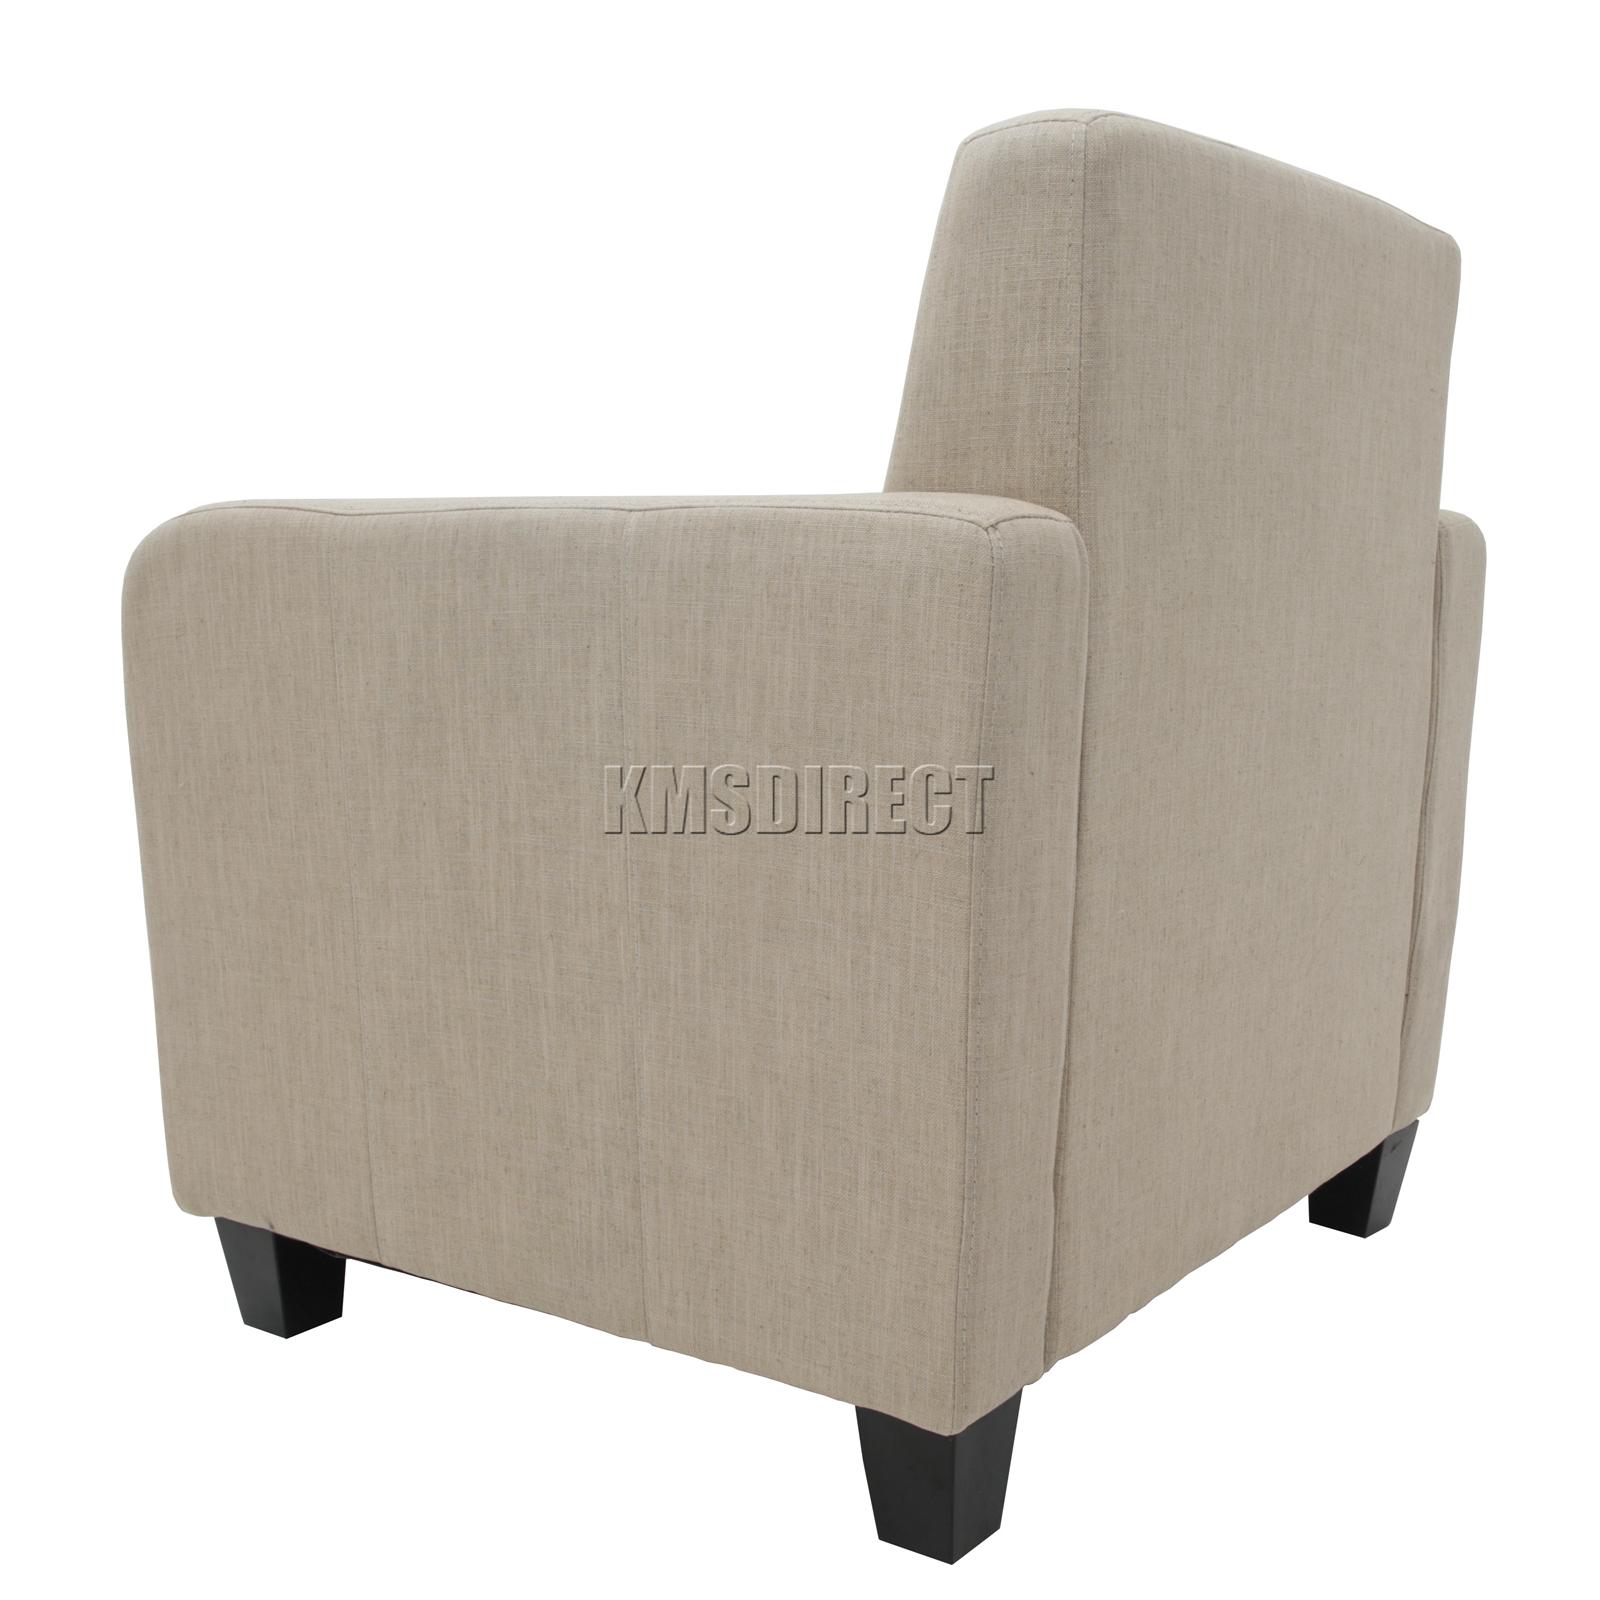 Foxhunter Tub Stuhl Sessel Leinenstoff Esszimmer